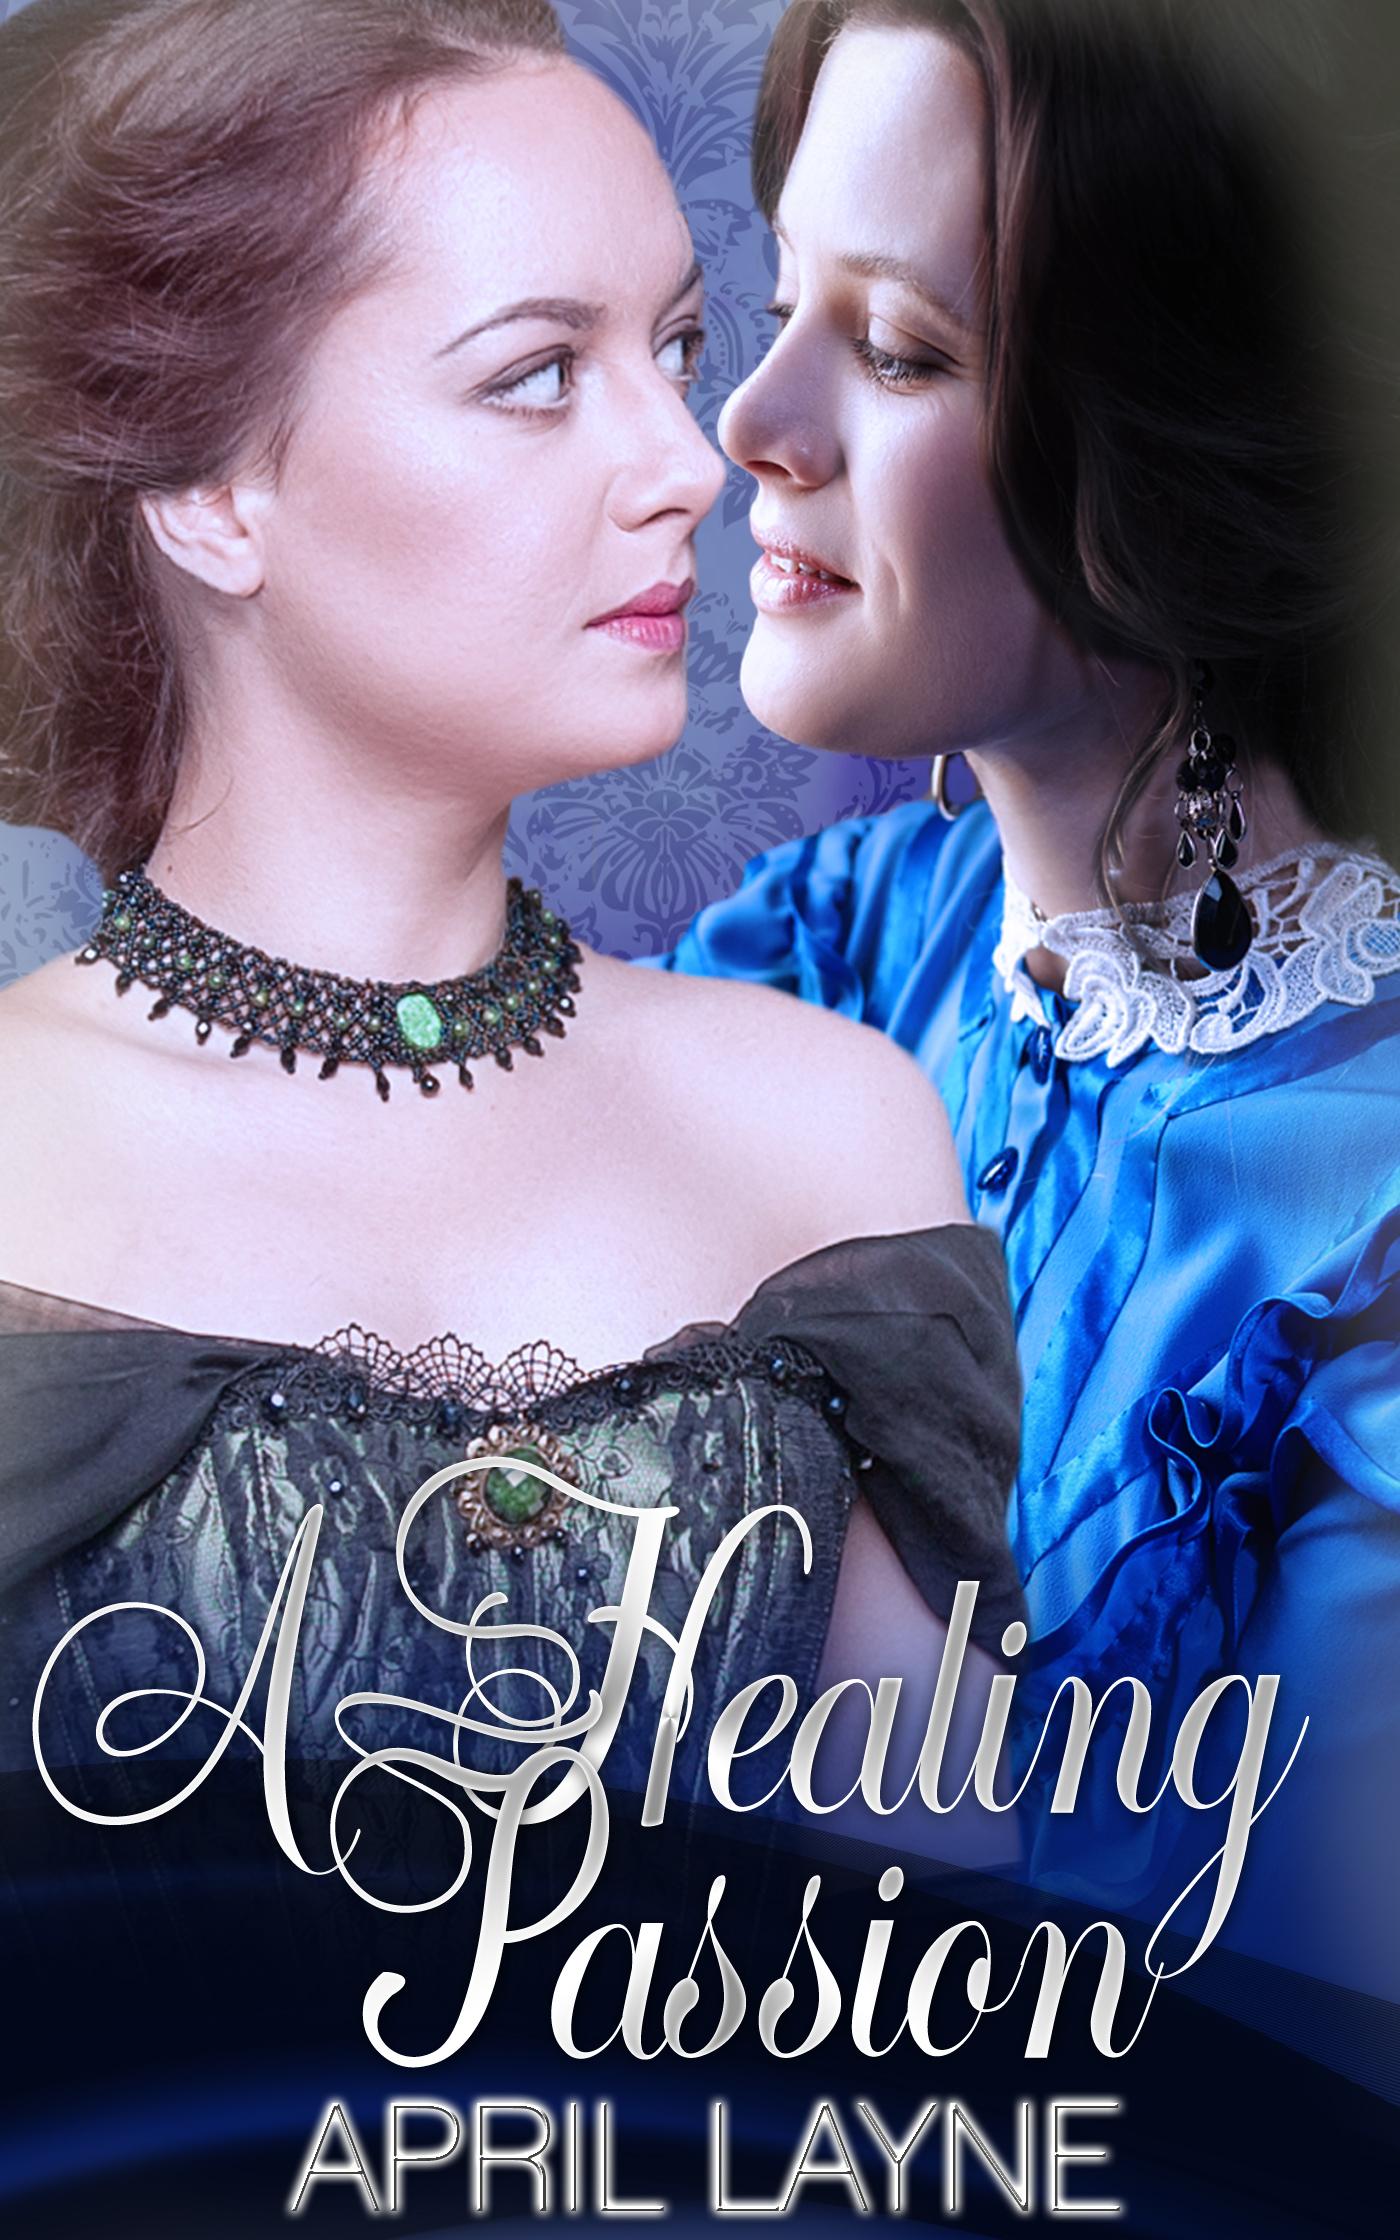 A Healing Passion April Layne